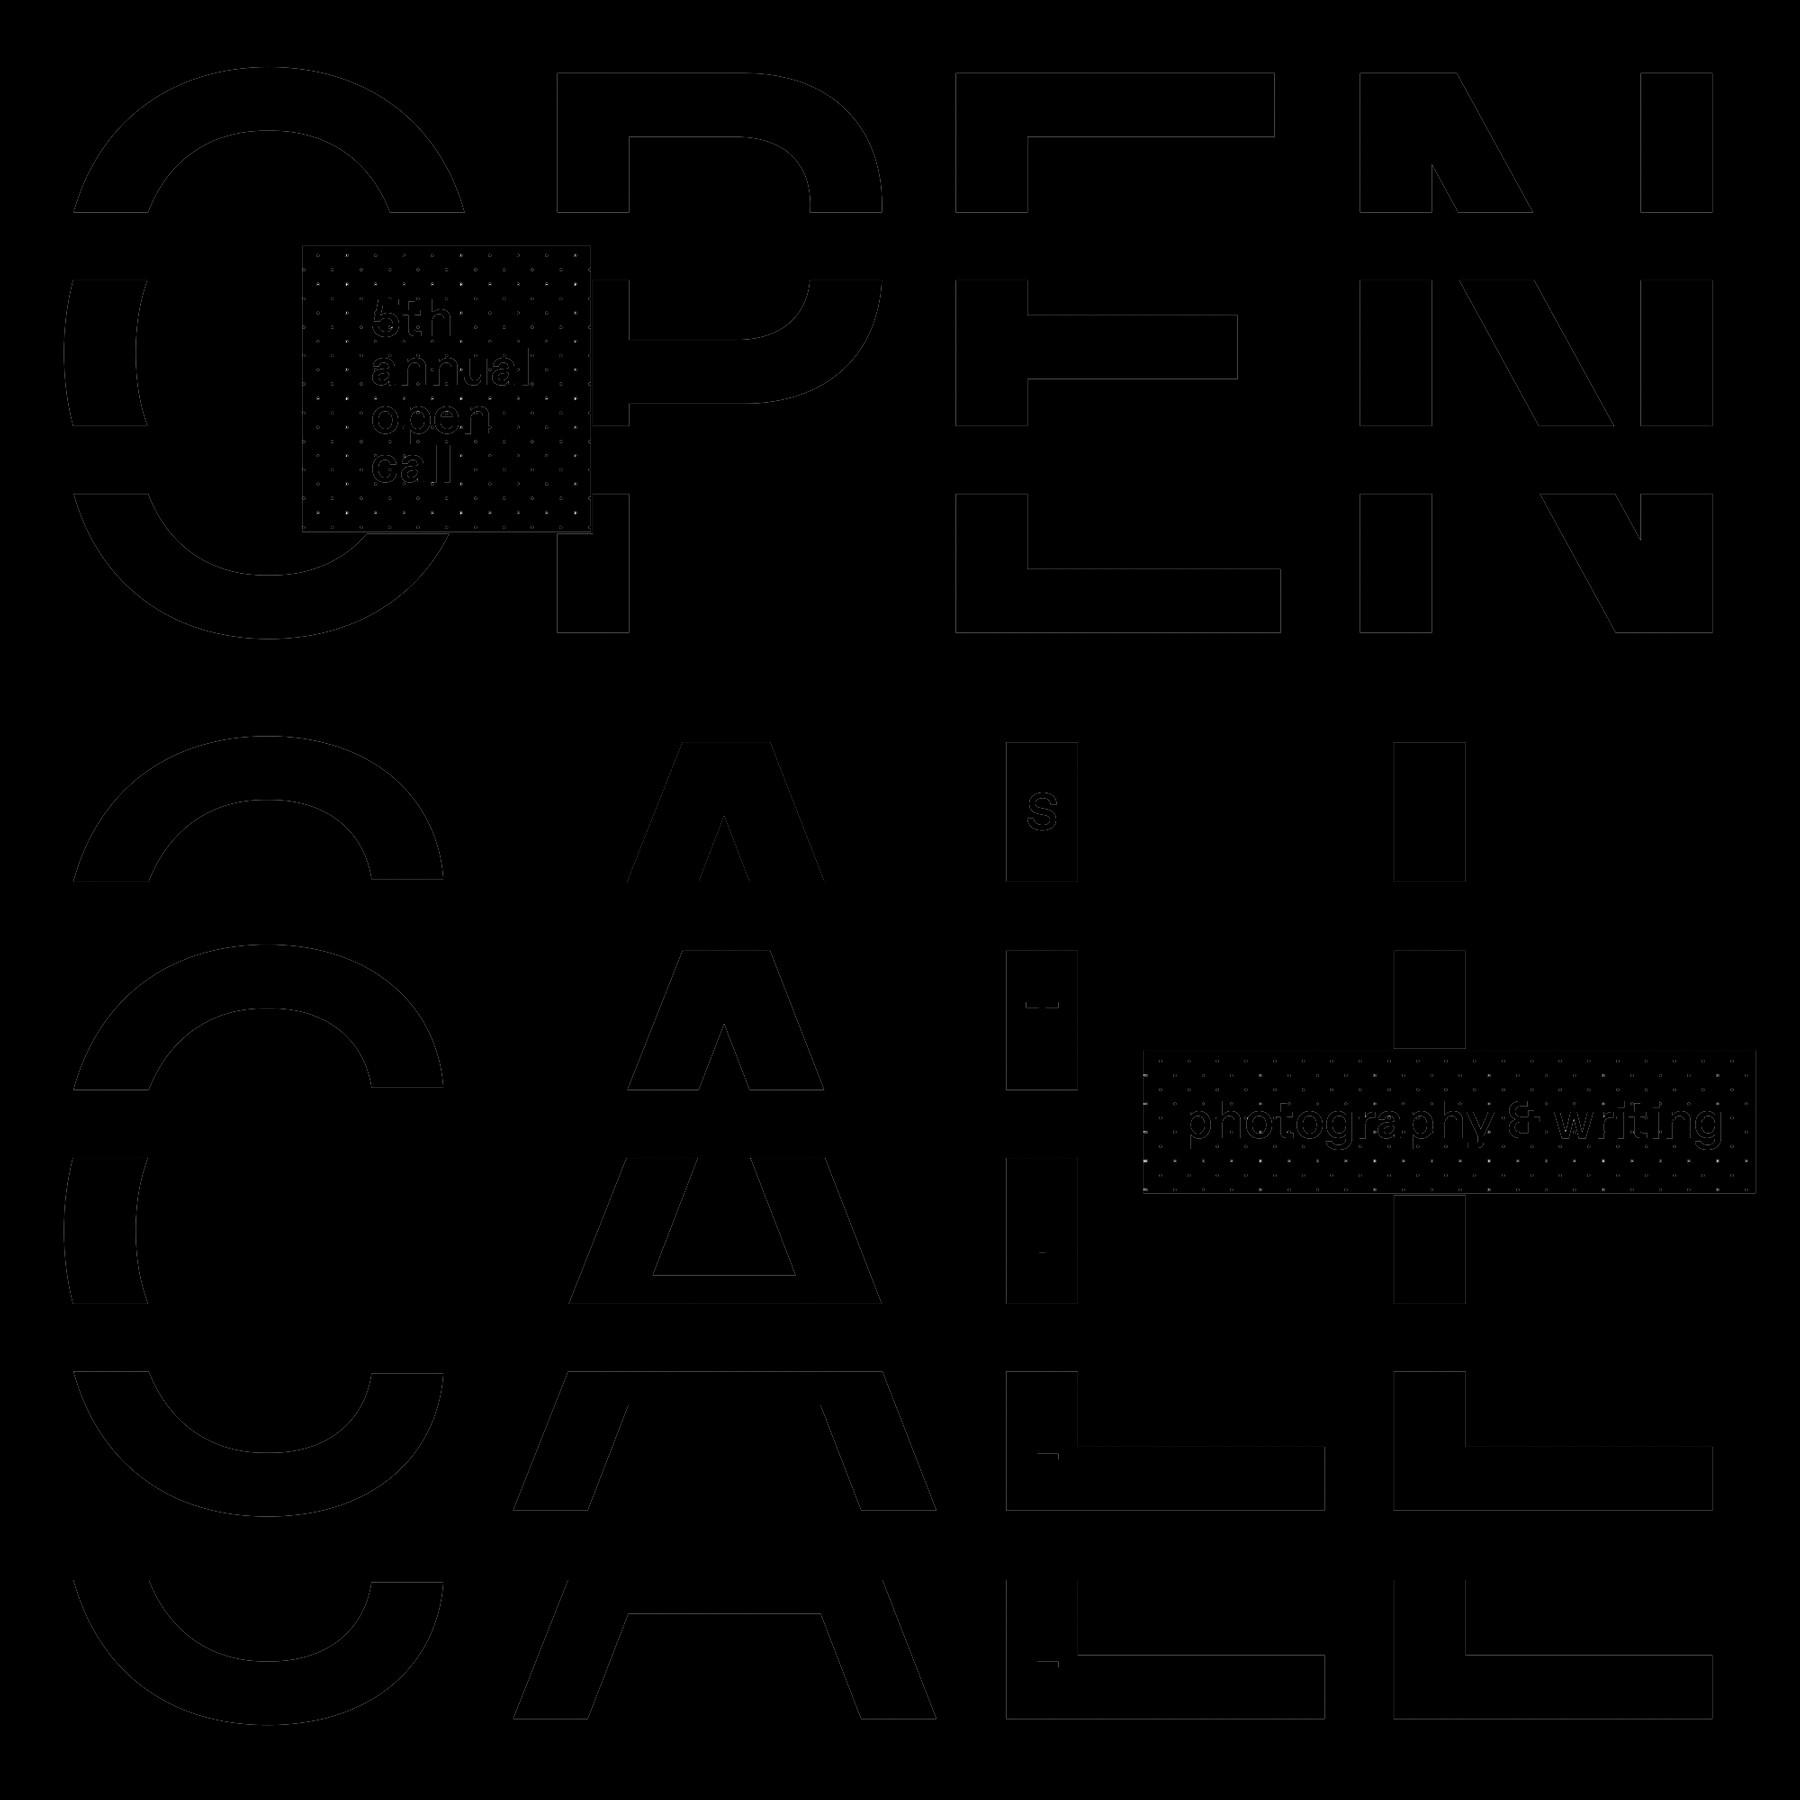 open-call-STILL-1-trans.png